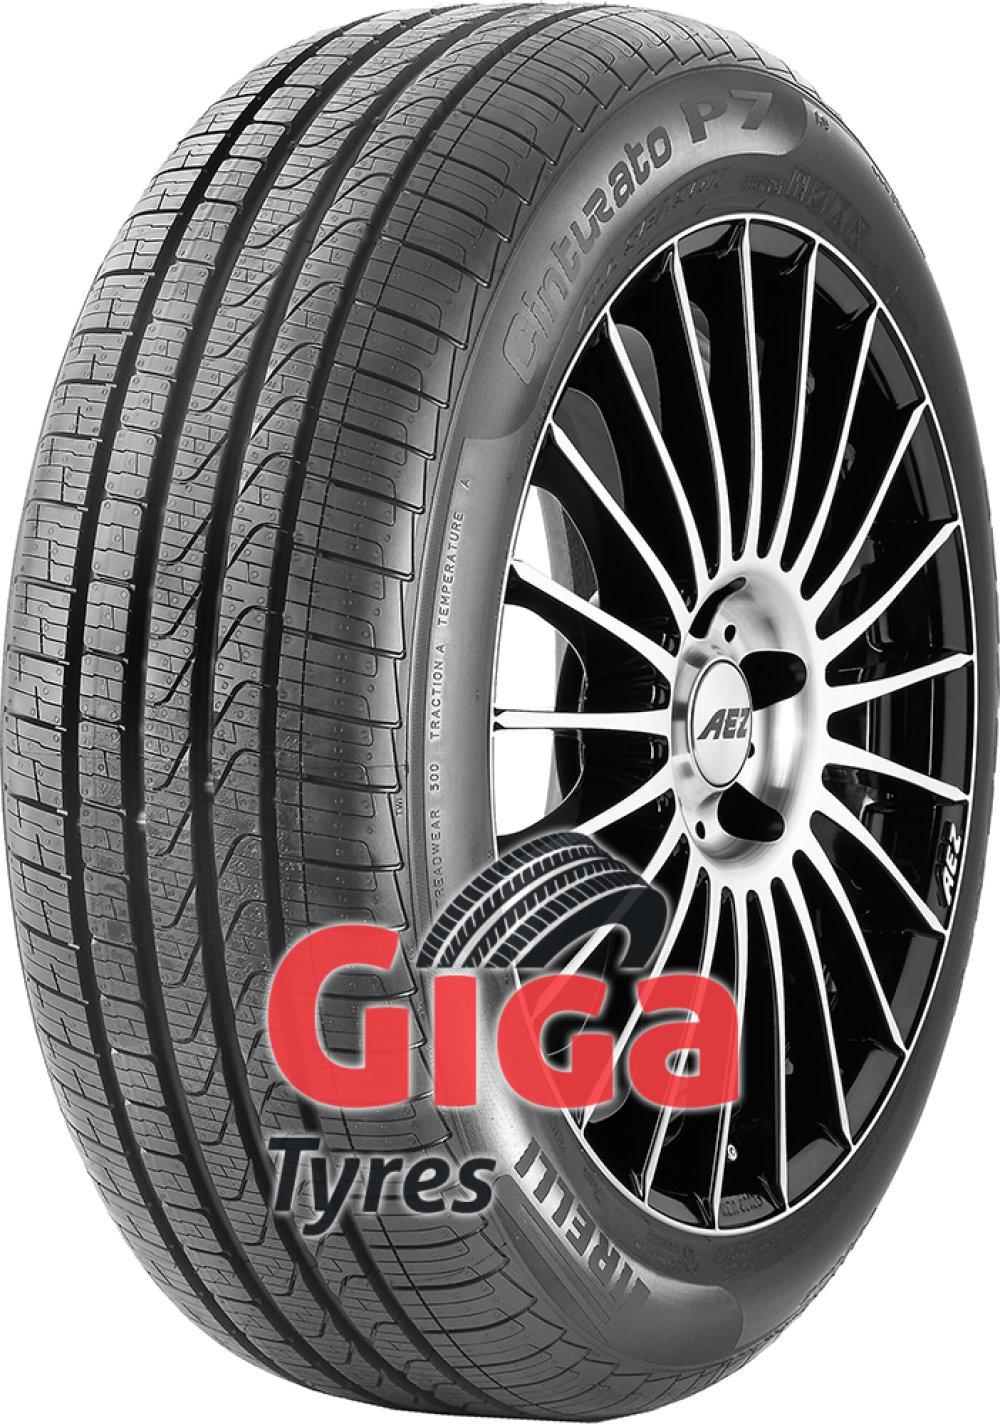 Pirelli Cinturato P7 A/S ( 295/35 R20 105V XL ECOIMPACT, N0, with rim protection (MFS) )